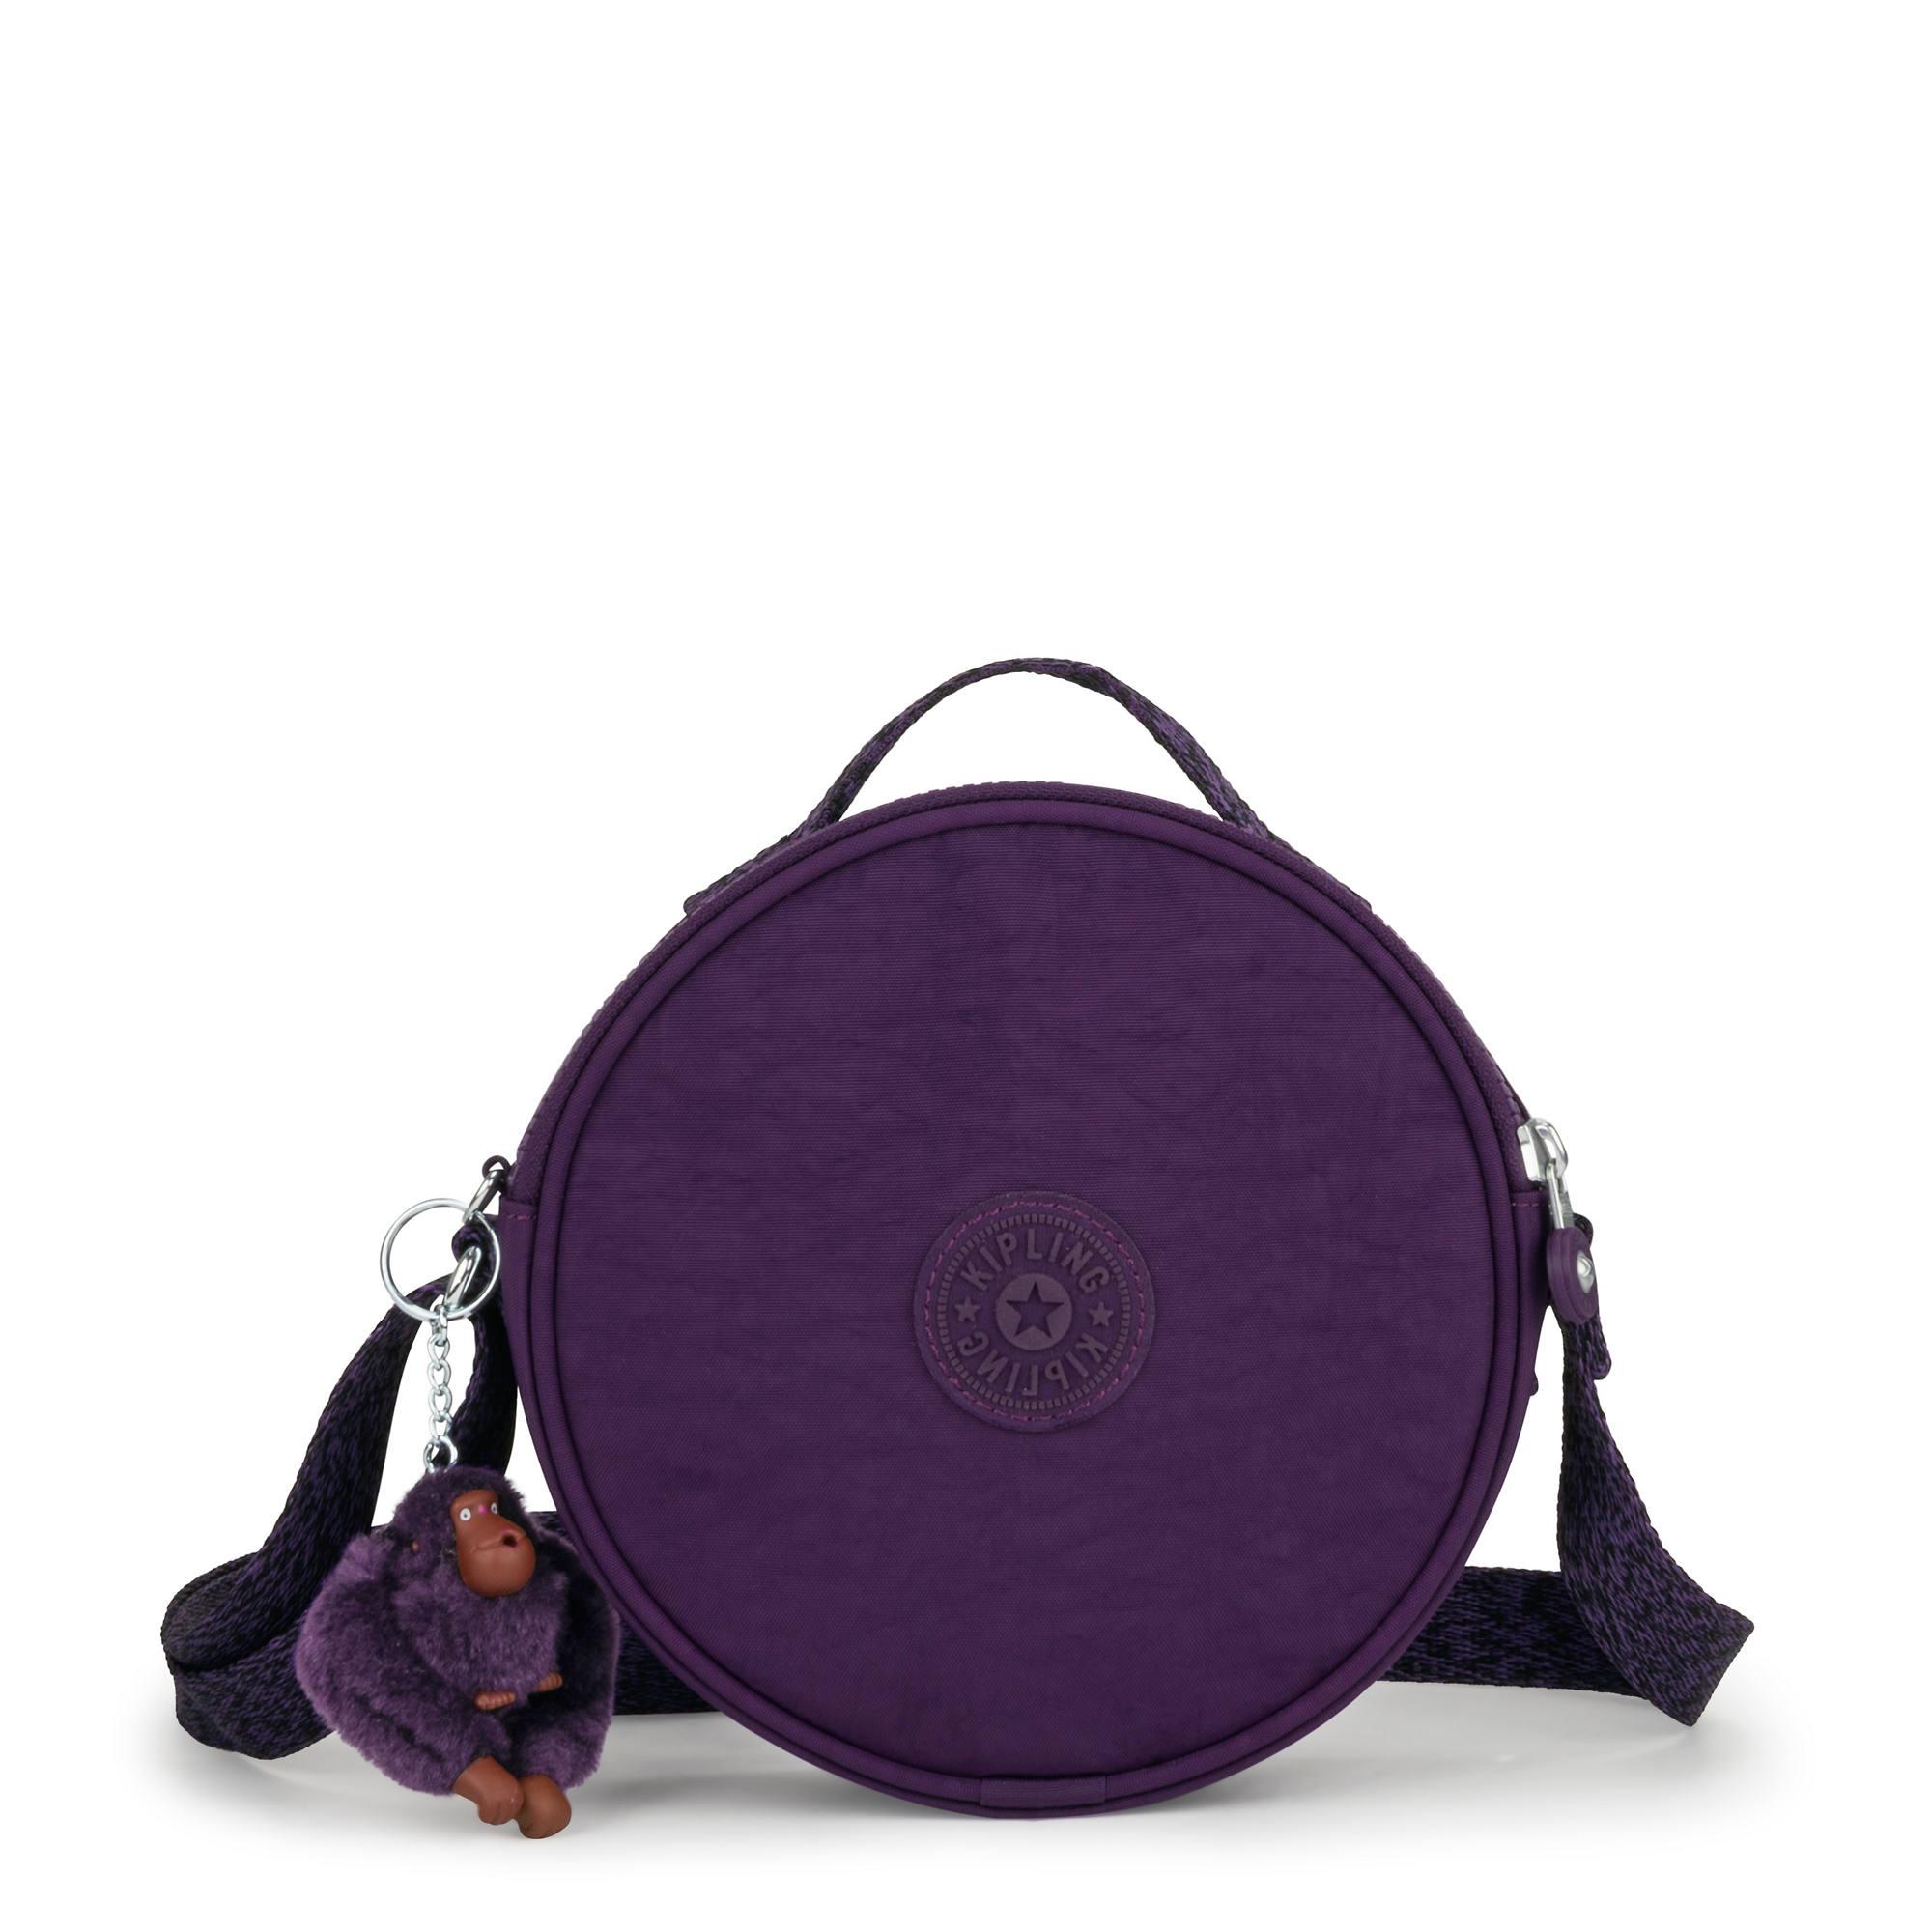 Raquel Round Handbag